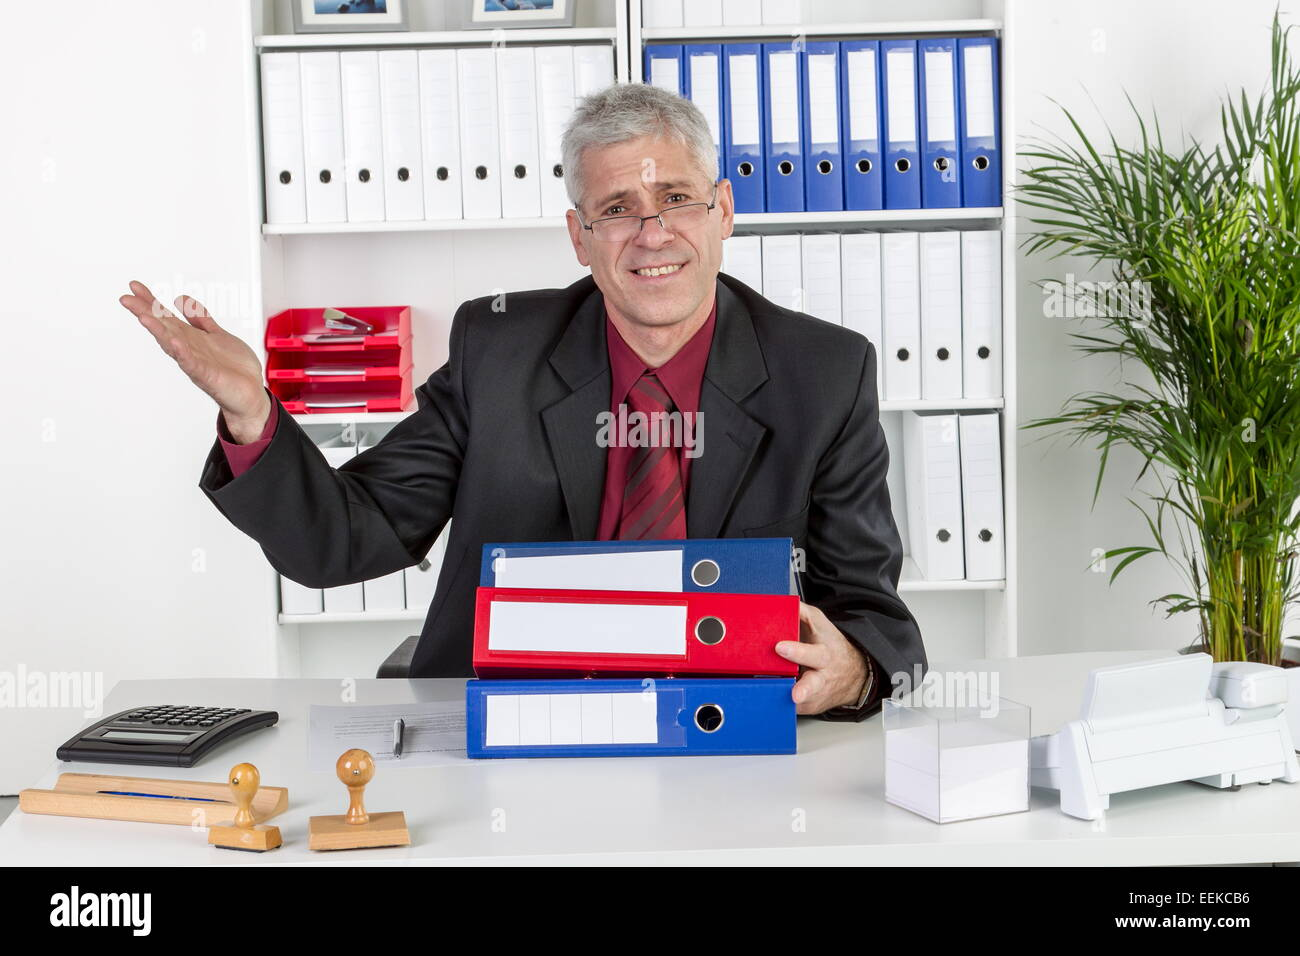 Mann mittleren altera sitzt im Büro und gestikuliert, uomo di mezza età, seduto nel suo ufficio, gesticulating Foto Stock